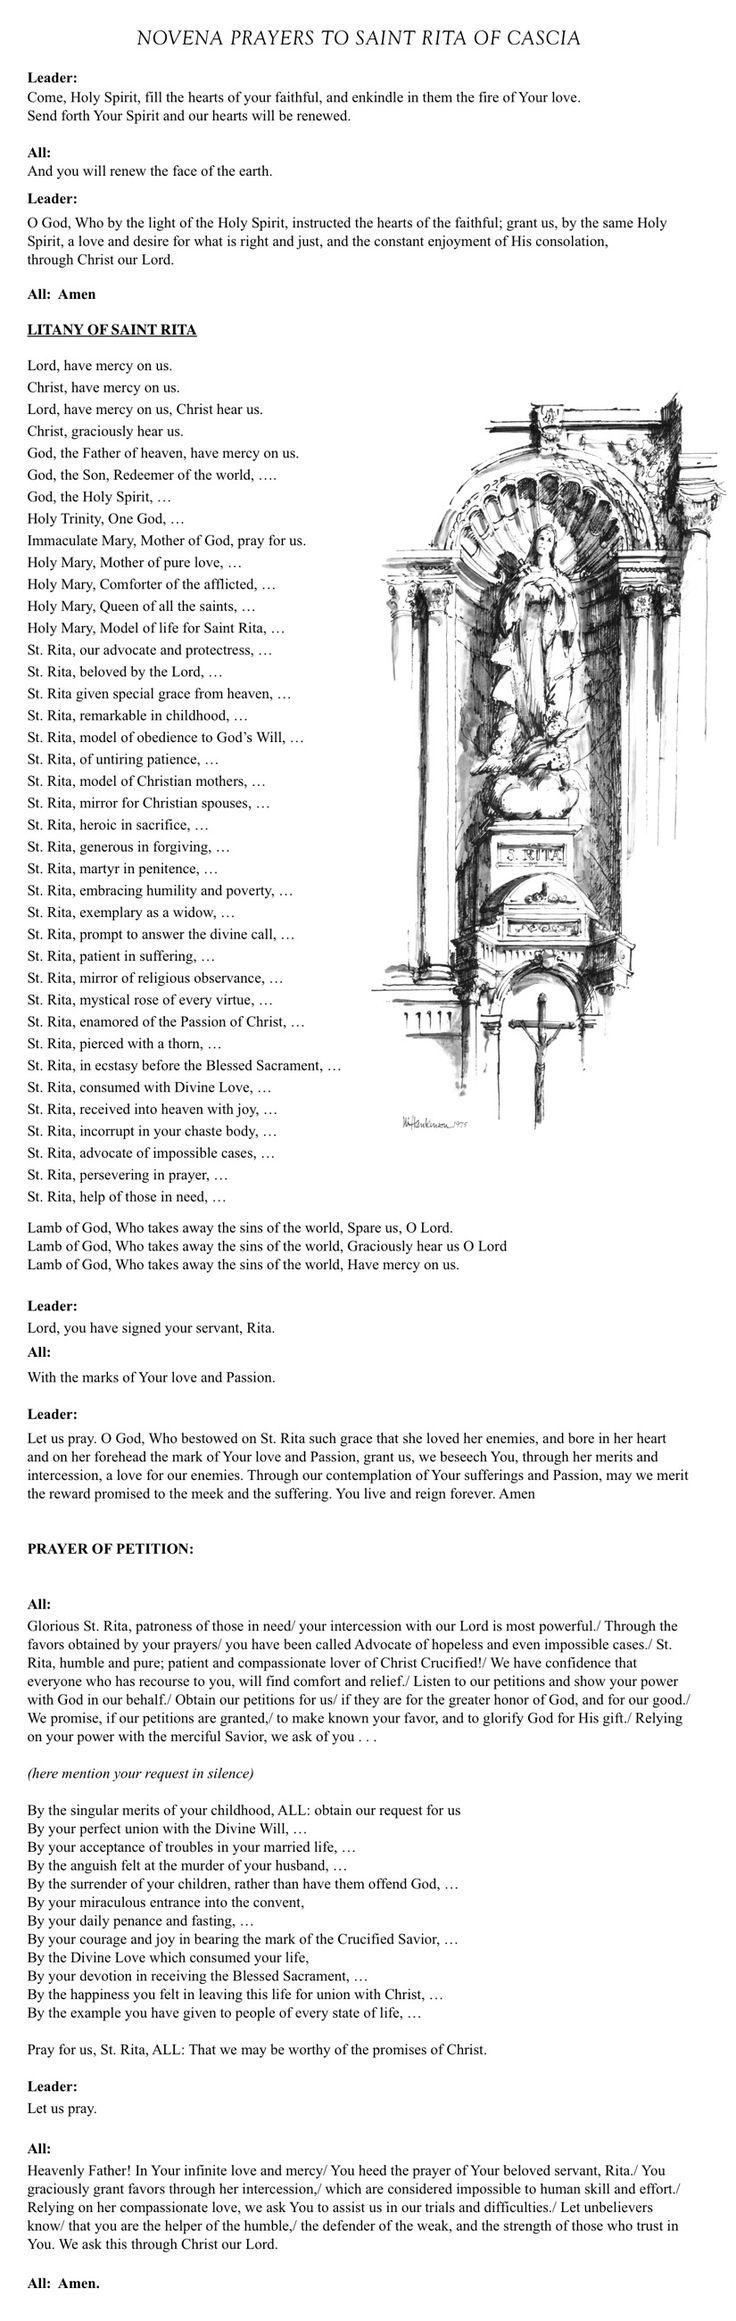 St. Rita Prayers 2